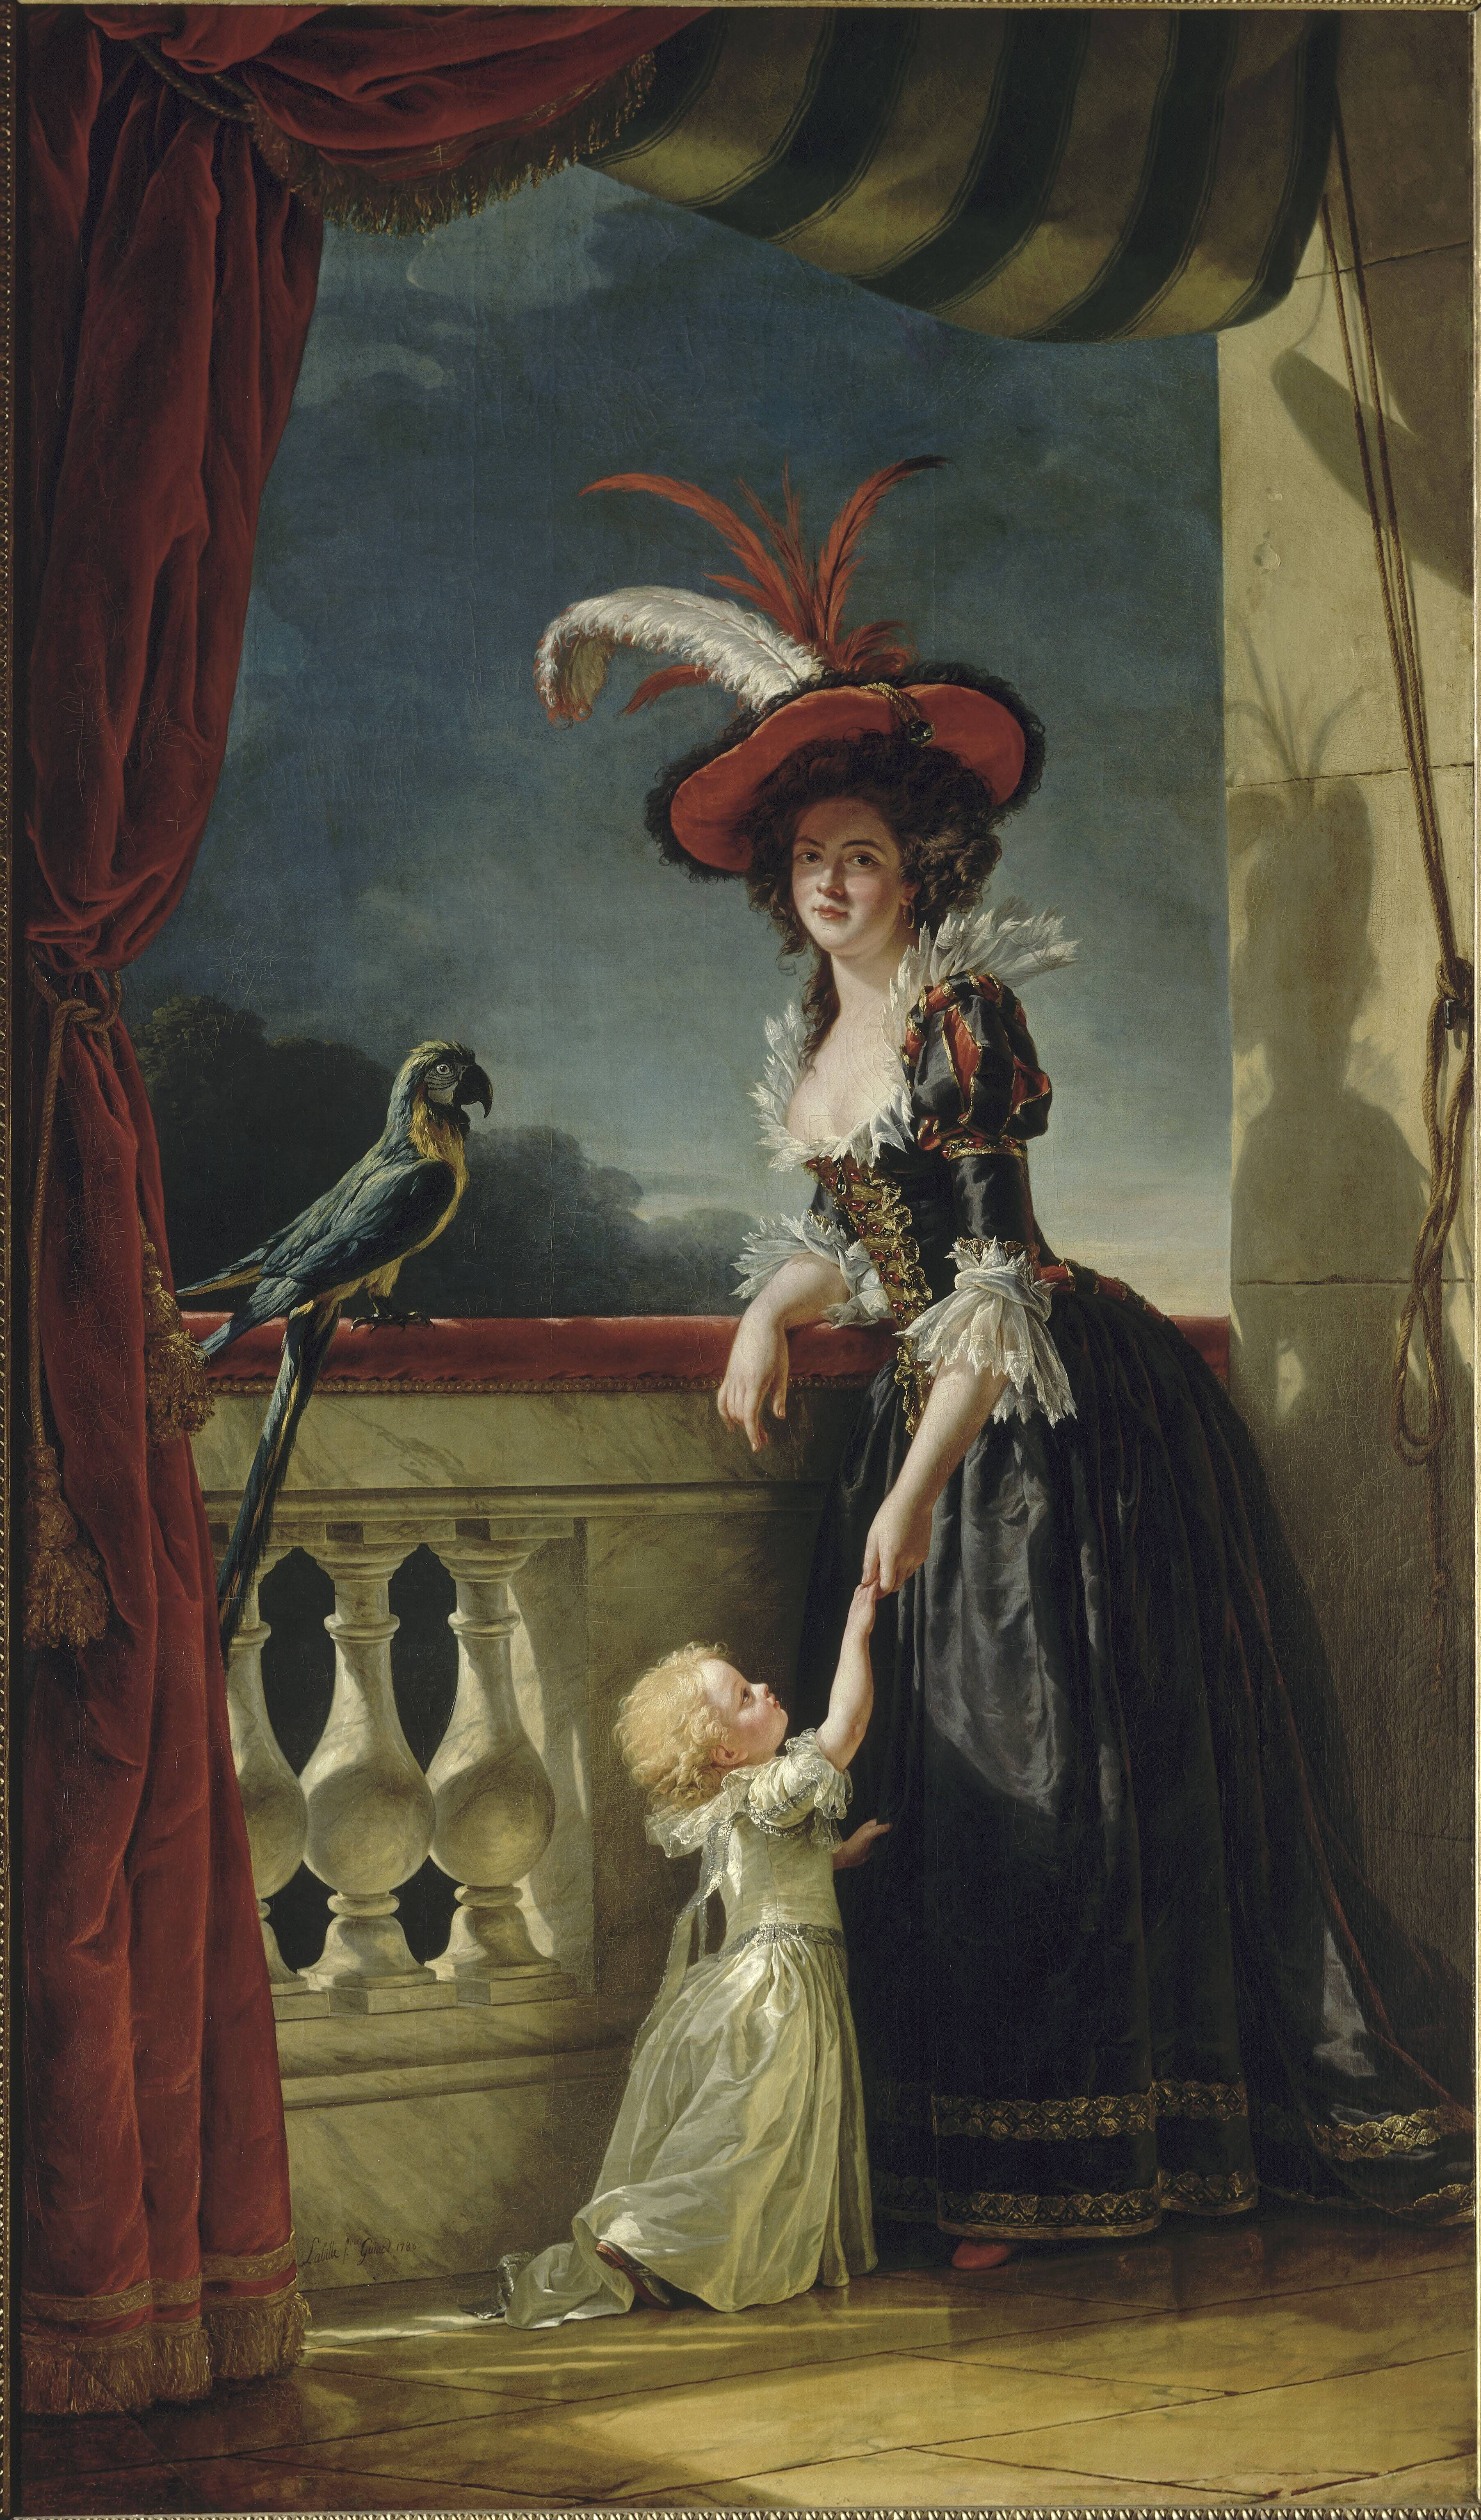 La comtesse Diane de Polignac  - Page 8 Mme_Louise-Elisabeth_with_her_two_year_old_son